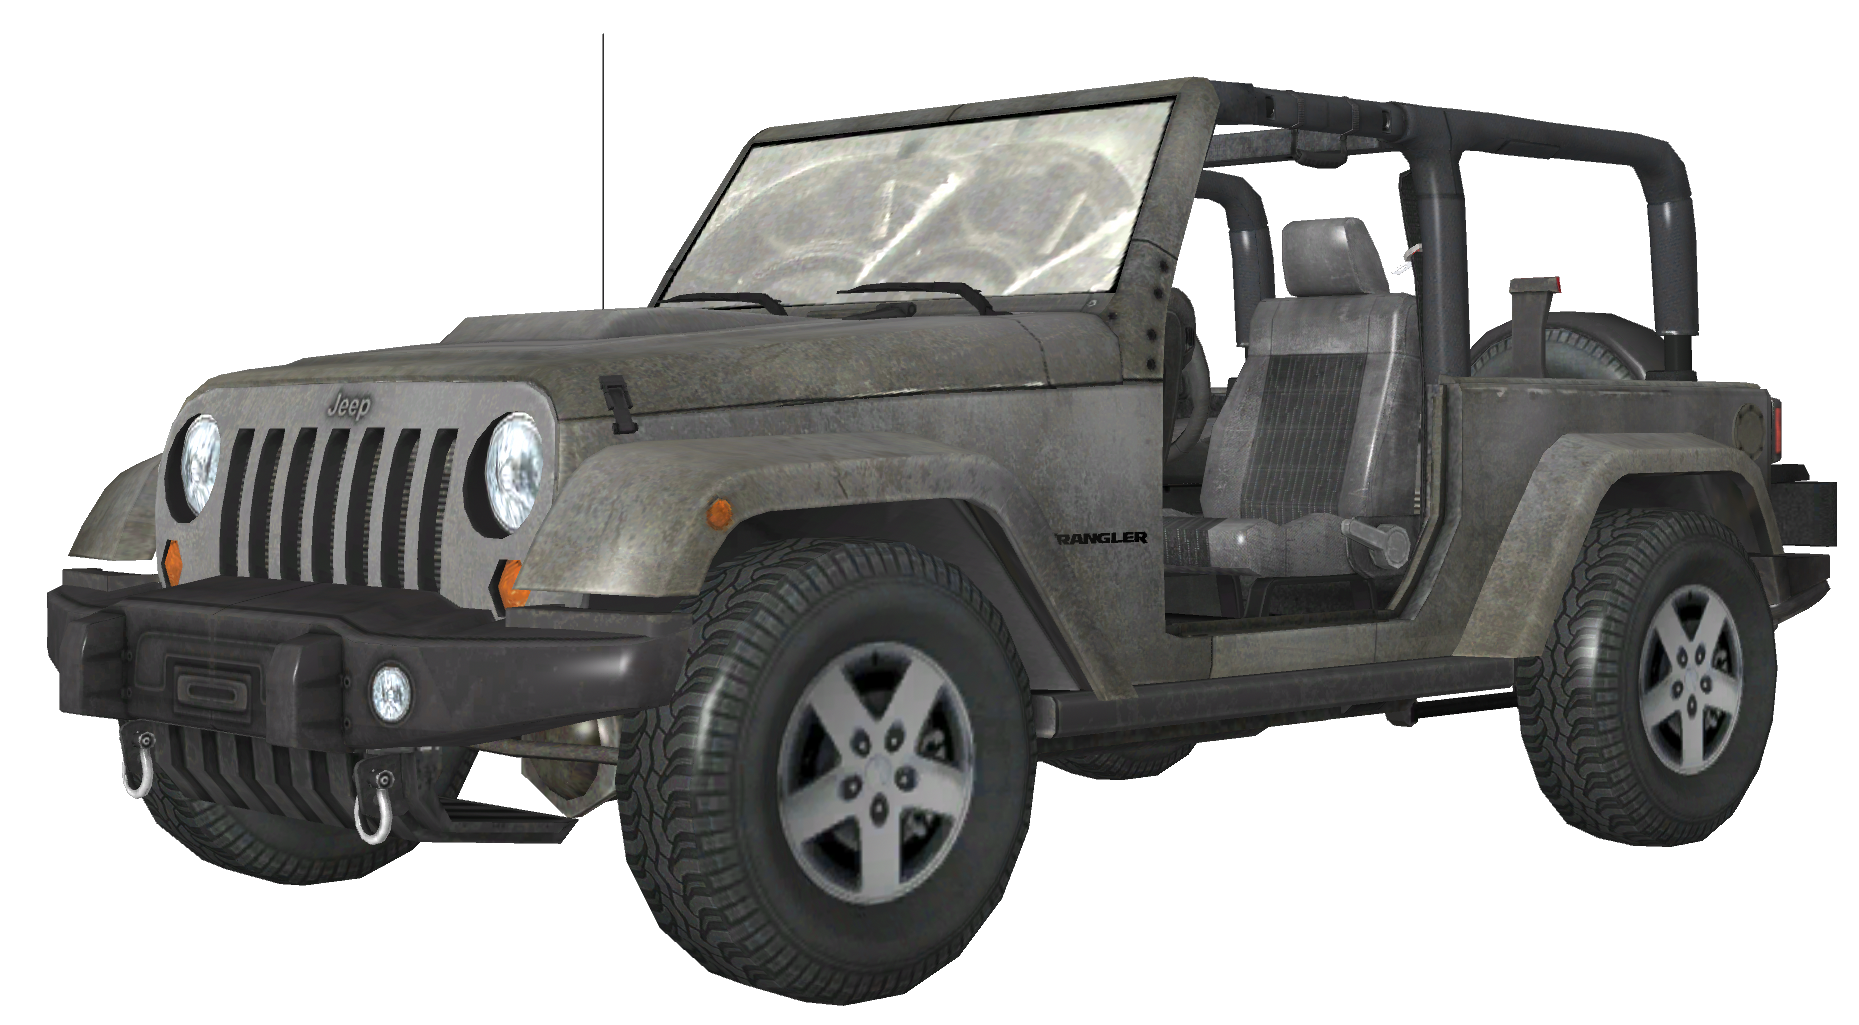 Image - Jeep Wrangler White m